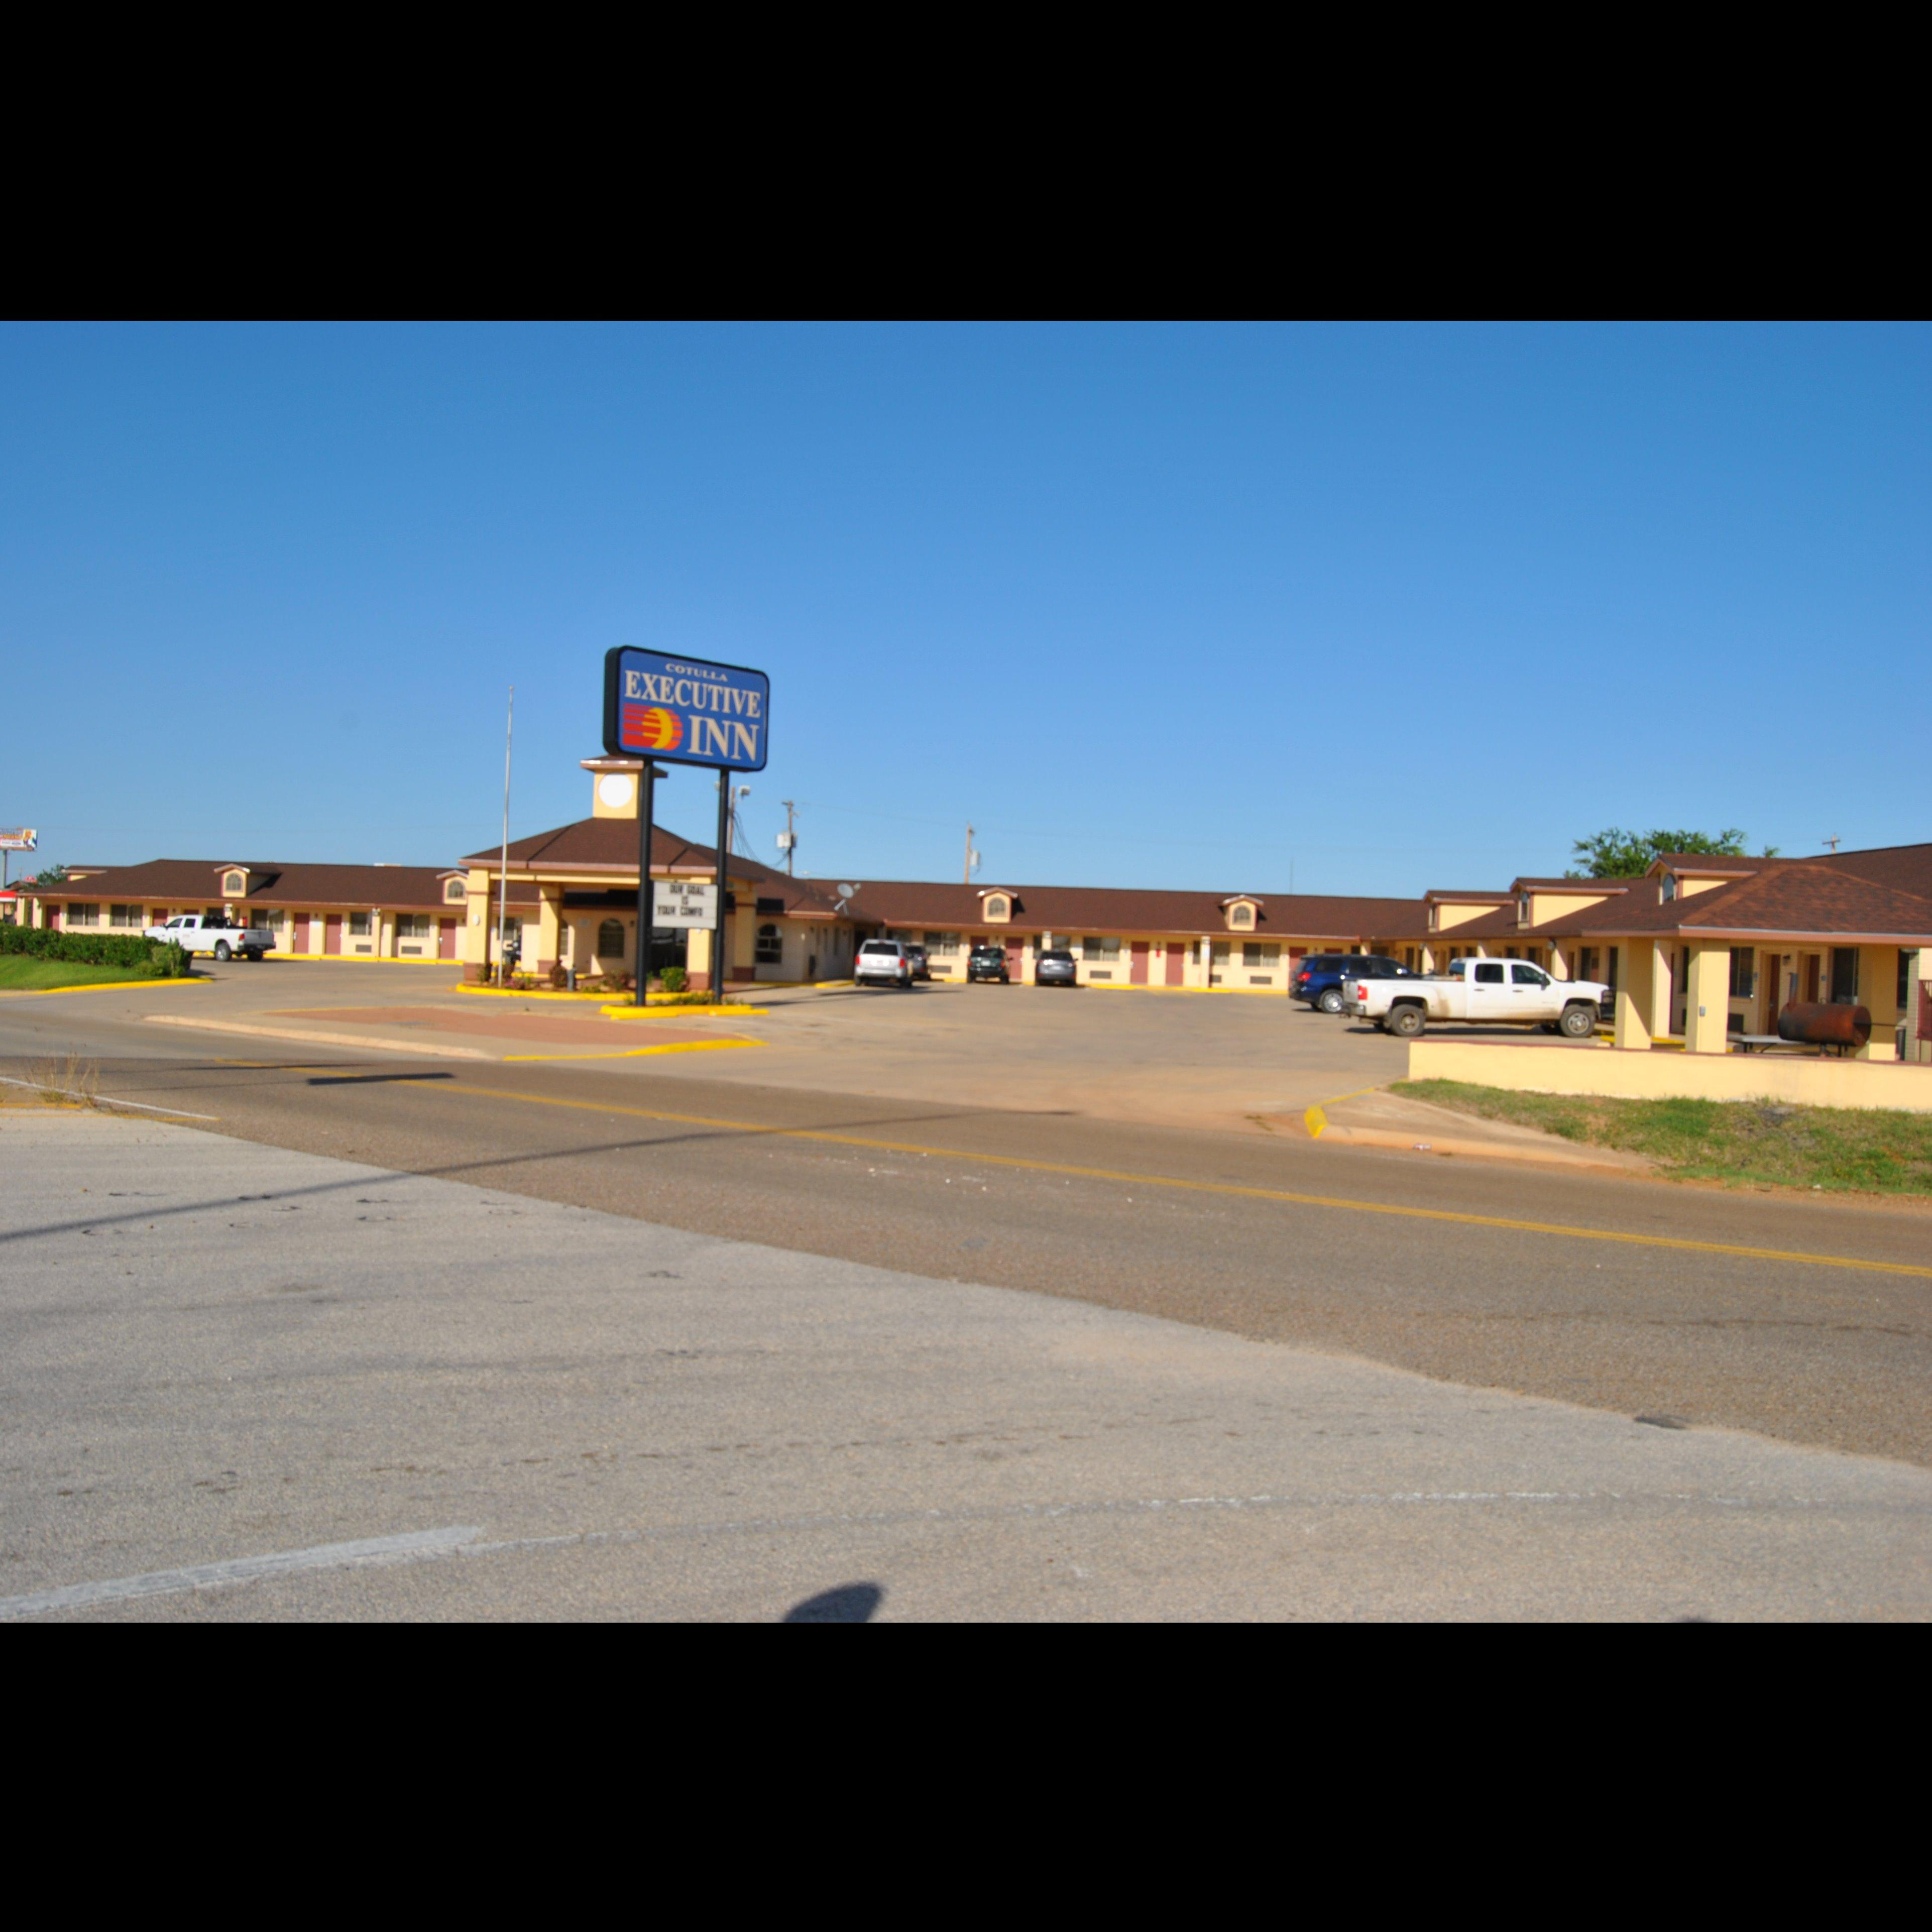 Laredo Executive Inn image 0